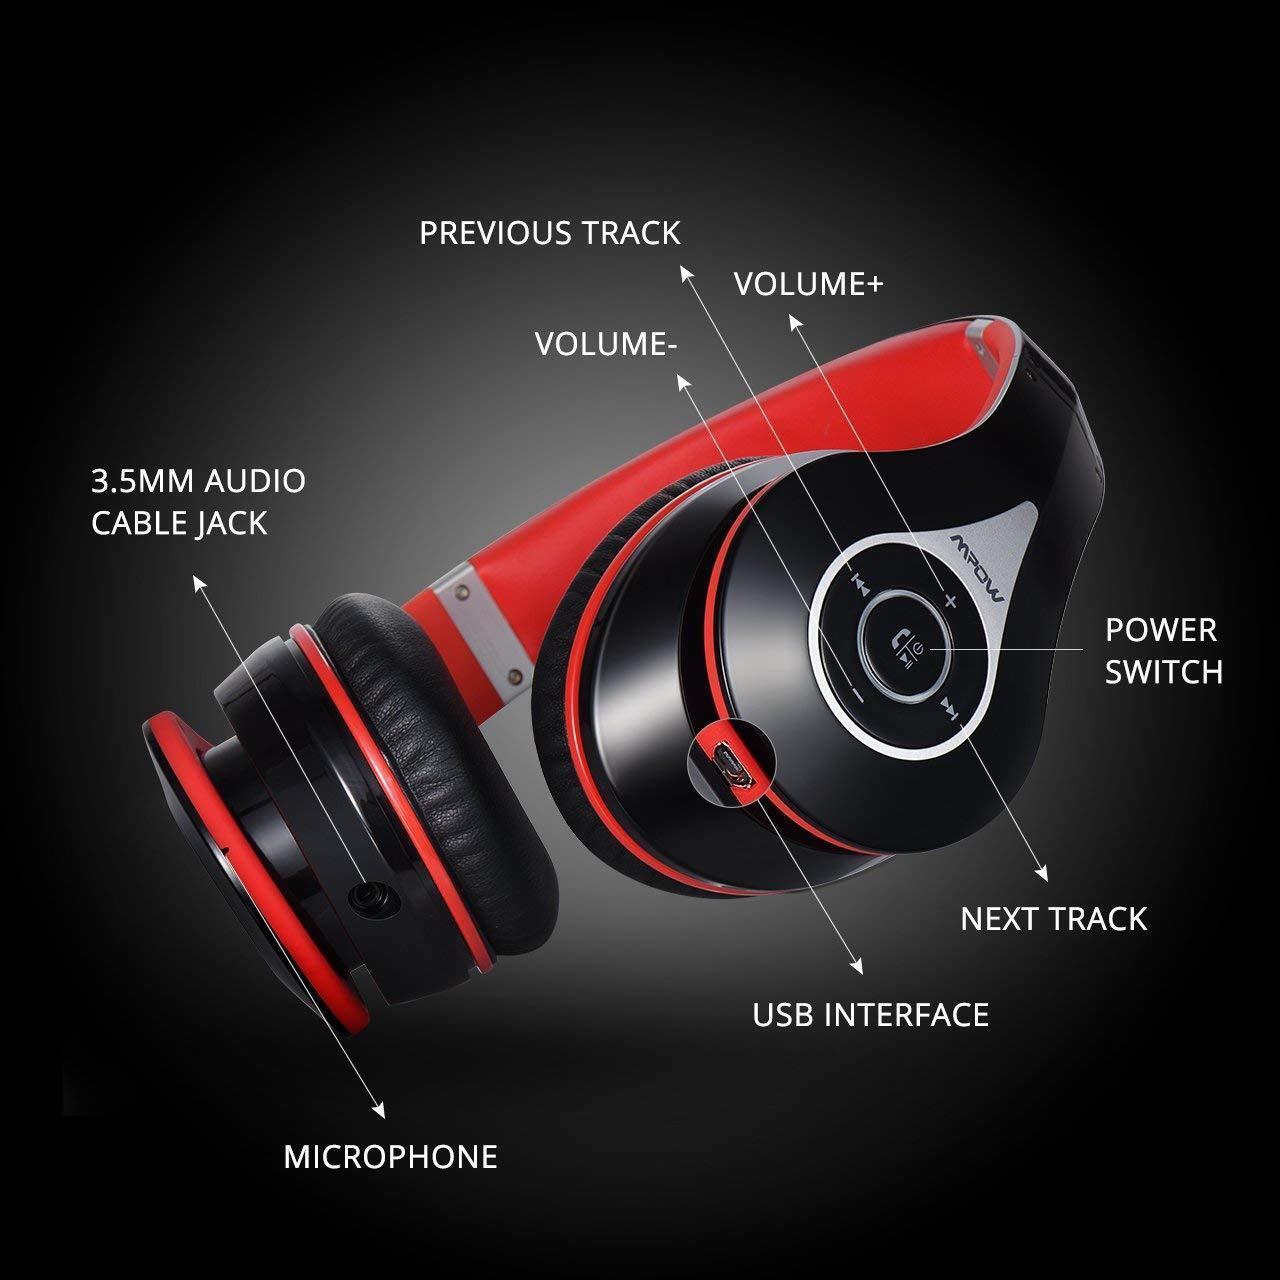 a9ad4f728459e9 Mpow 059 Bluetooth Headphones Over Ear, Hi-Fi Stereo Wireless Headset,  Foldable 3 3 of 12 ...